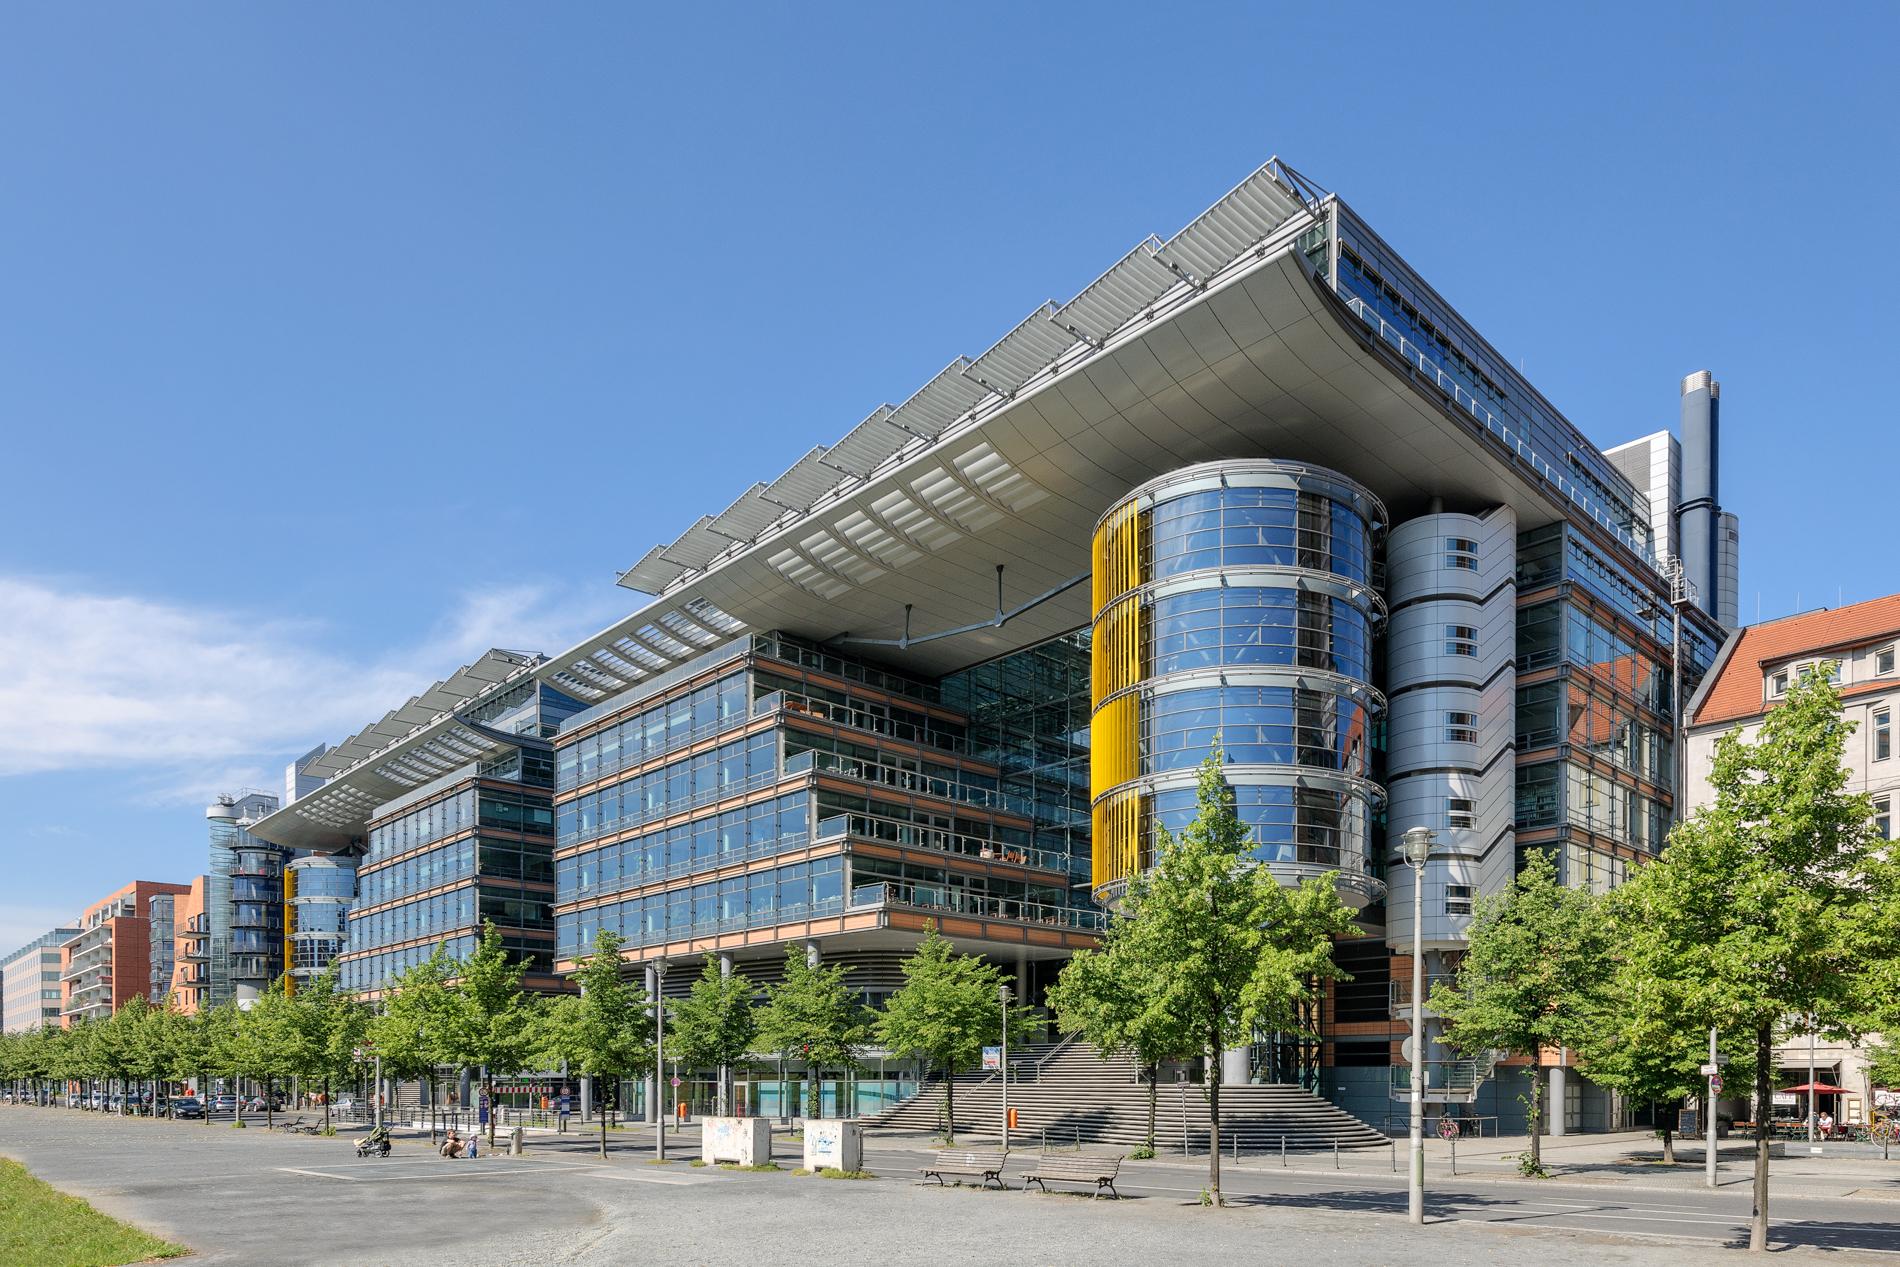 Office Buildings Street View   Potsdamer Platz